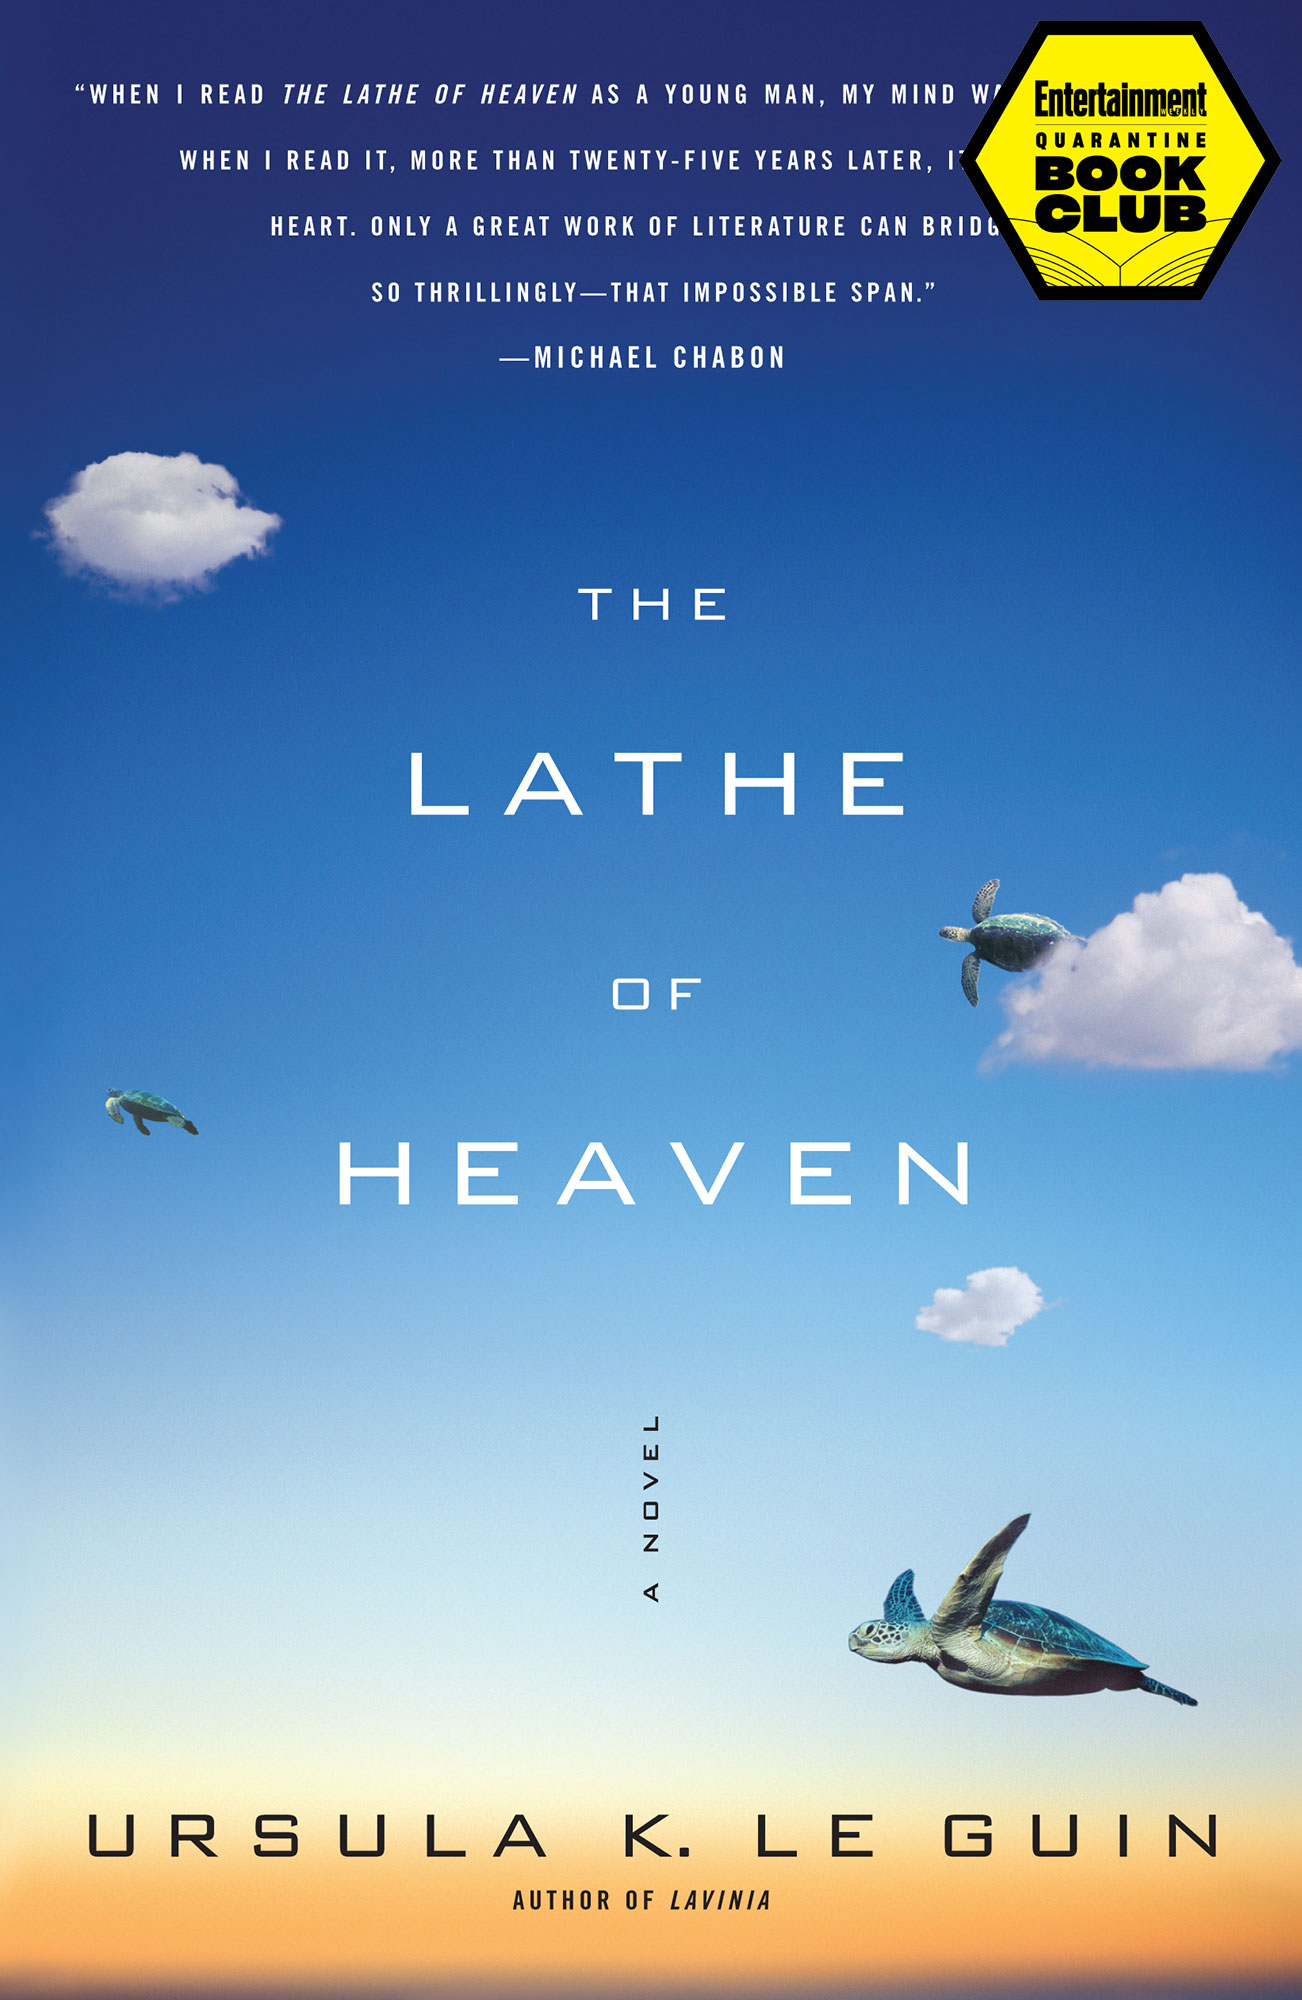 Lathe of Heaven by Ursula K. Le Guin